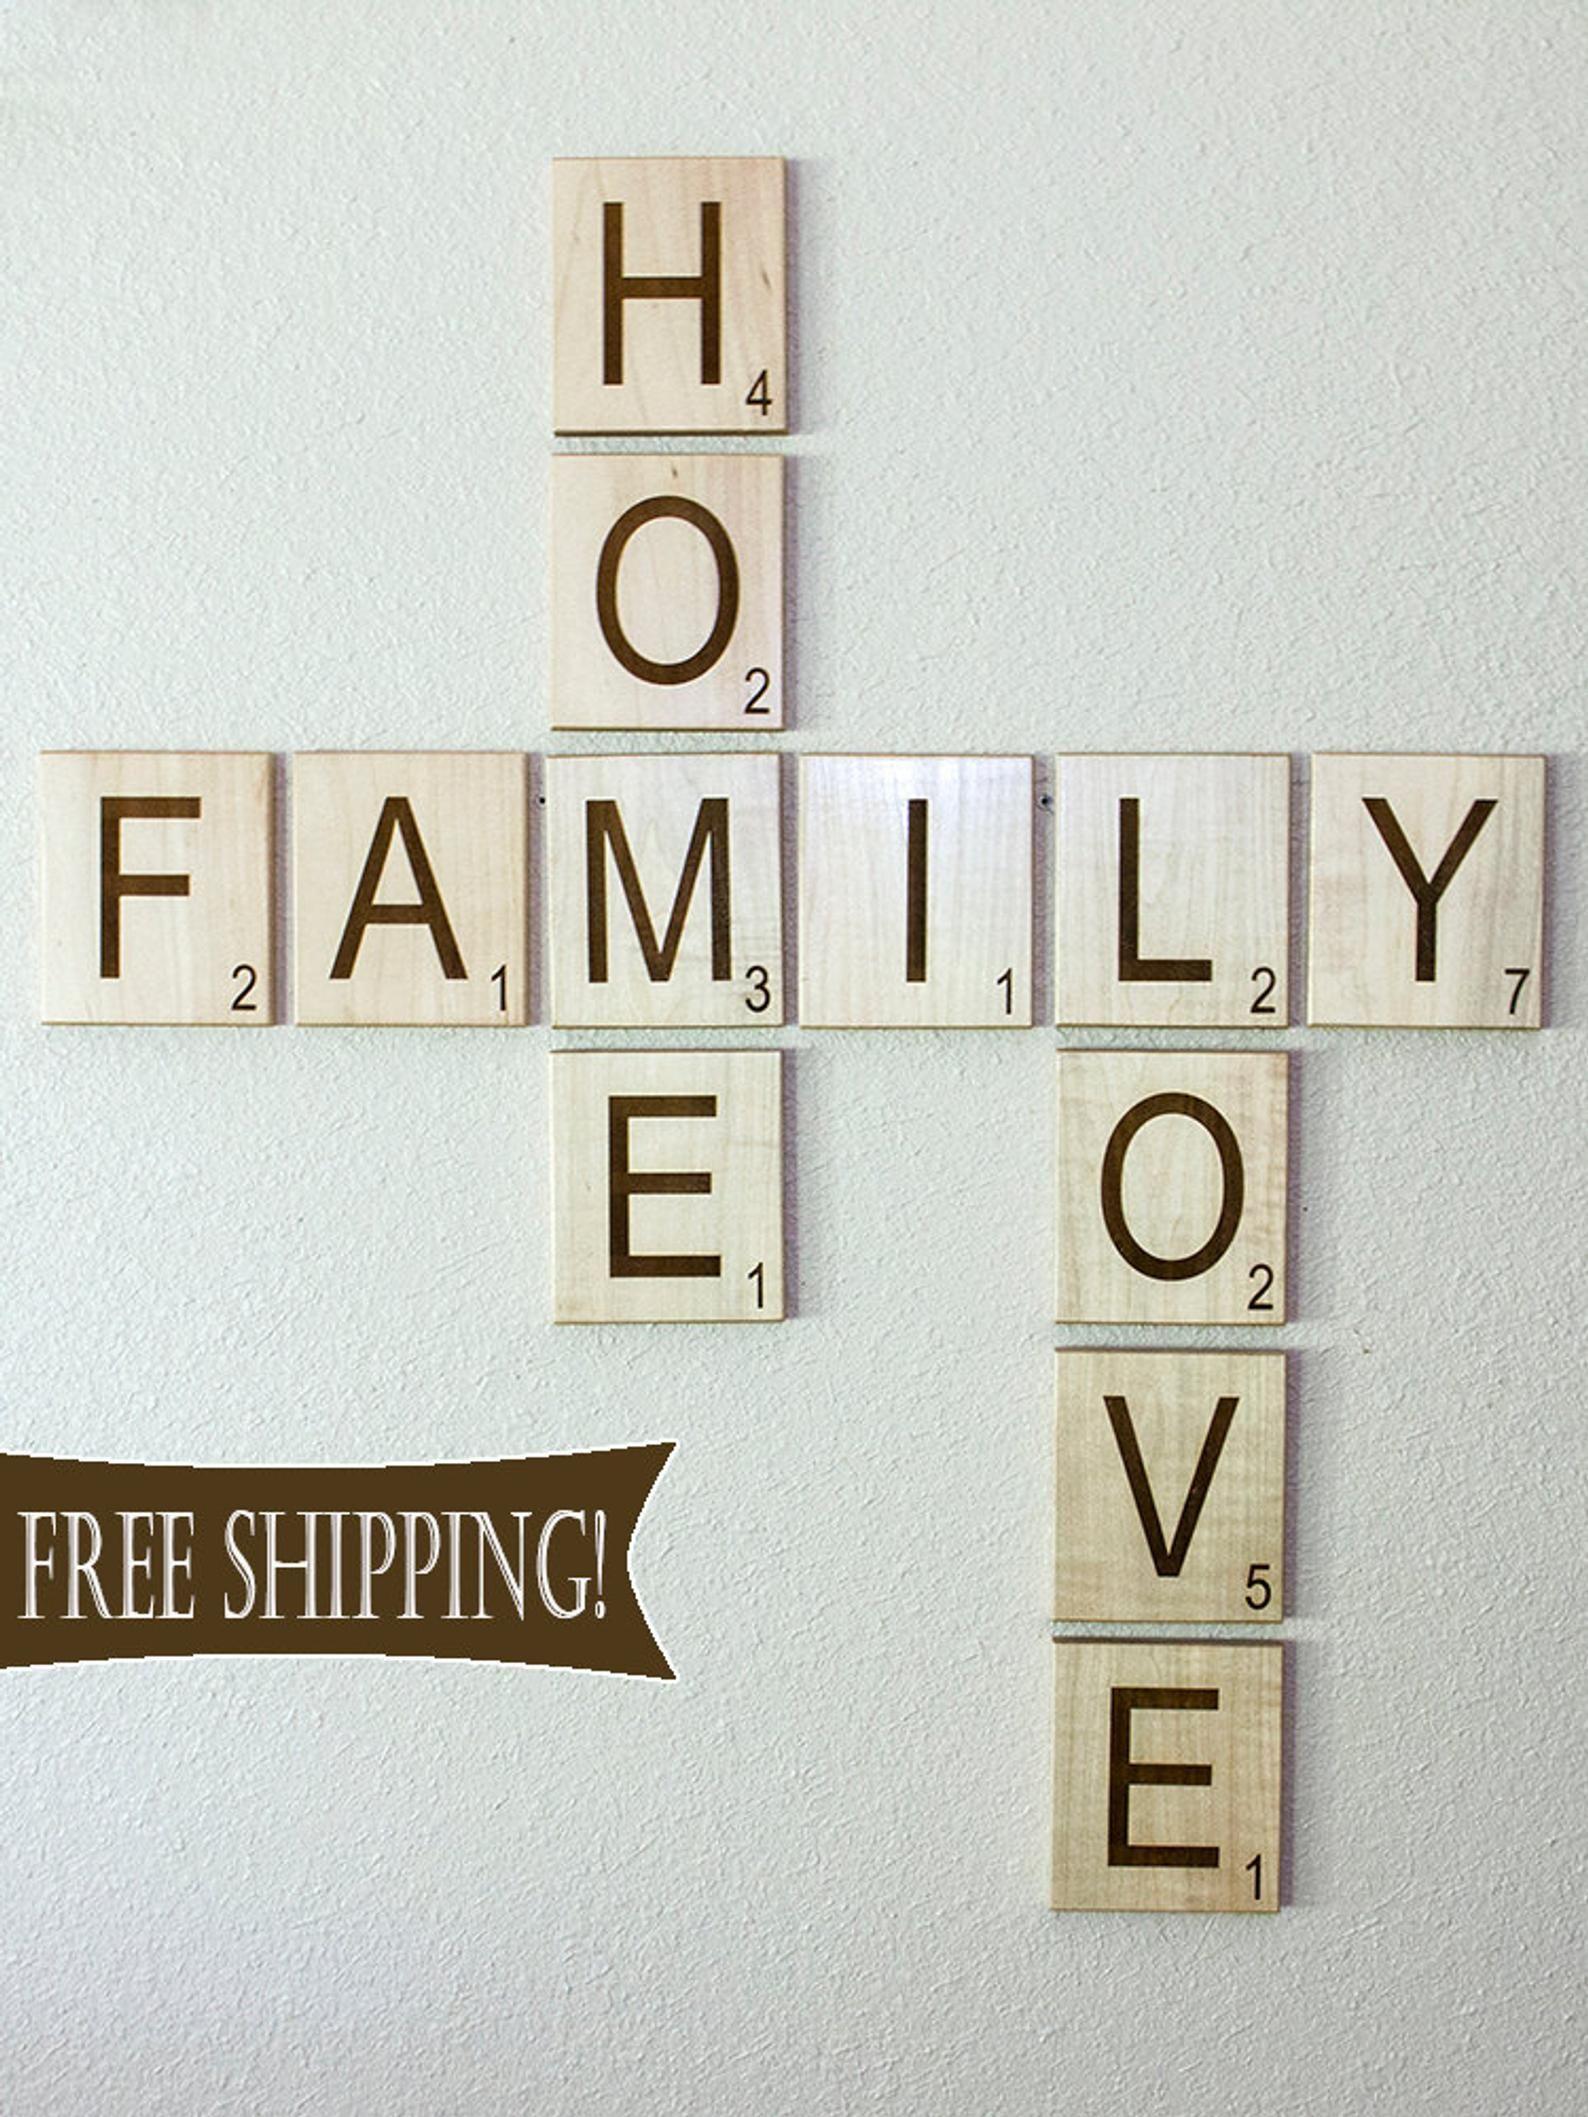 Scrabble Letters Large Individual Scrabble Tiles Crossword Etsy Scrabble Wall Decor Scrabble Wall Scrabble Letters Living room letters crossword